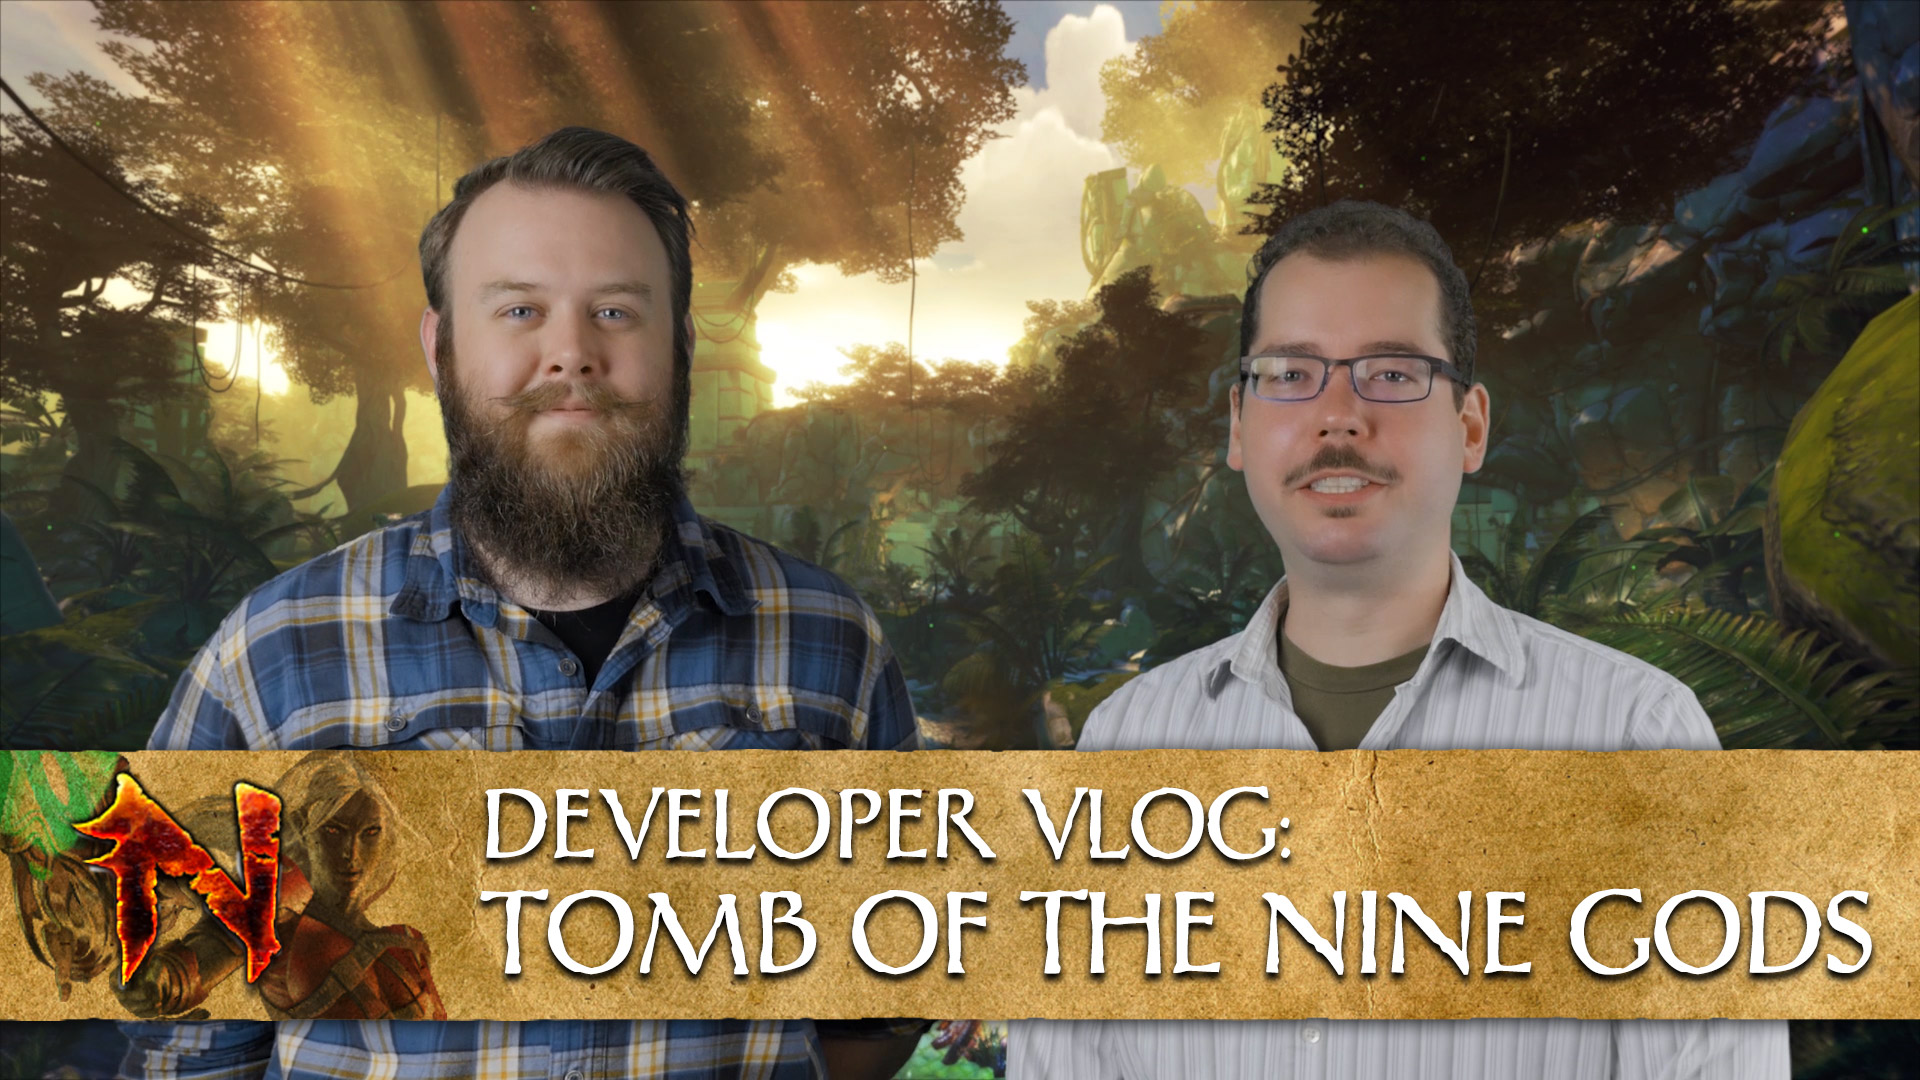 Developer Vlog: Tomb of the Nine Gods